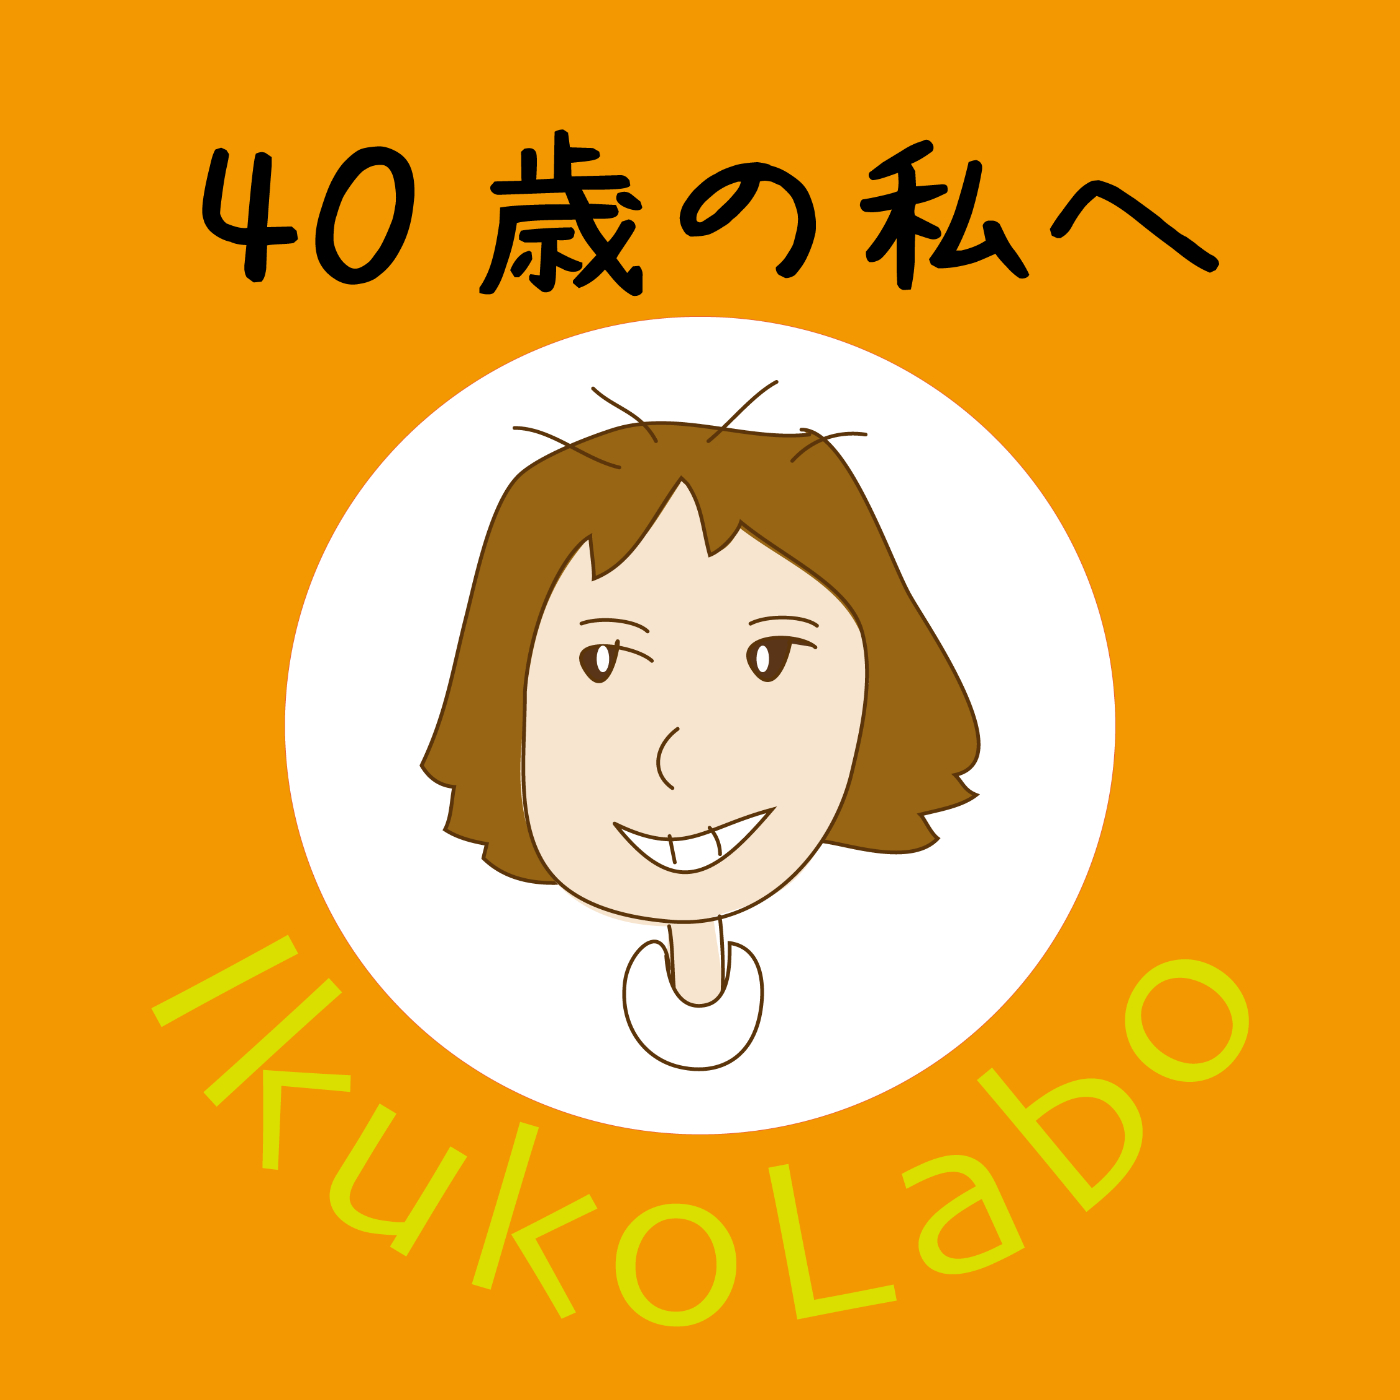 IKUKOLabo Wonderland